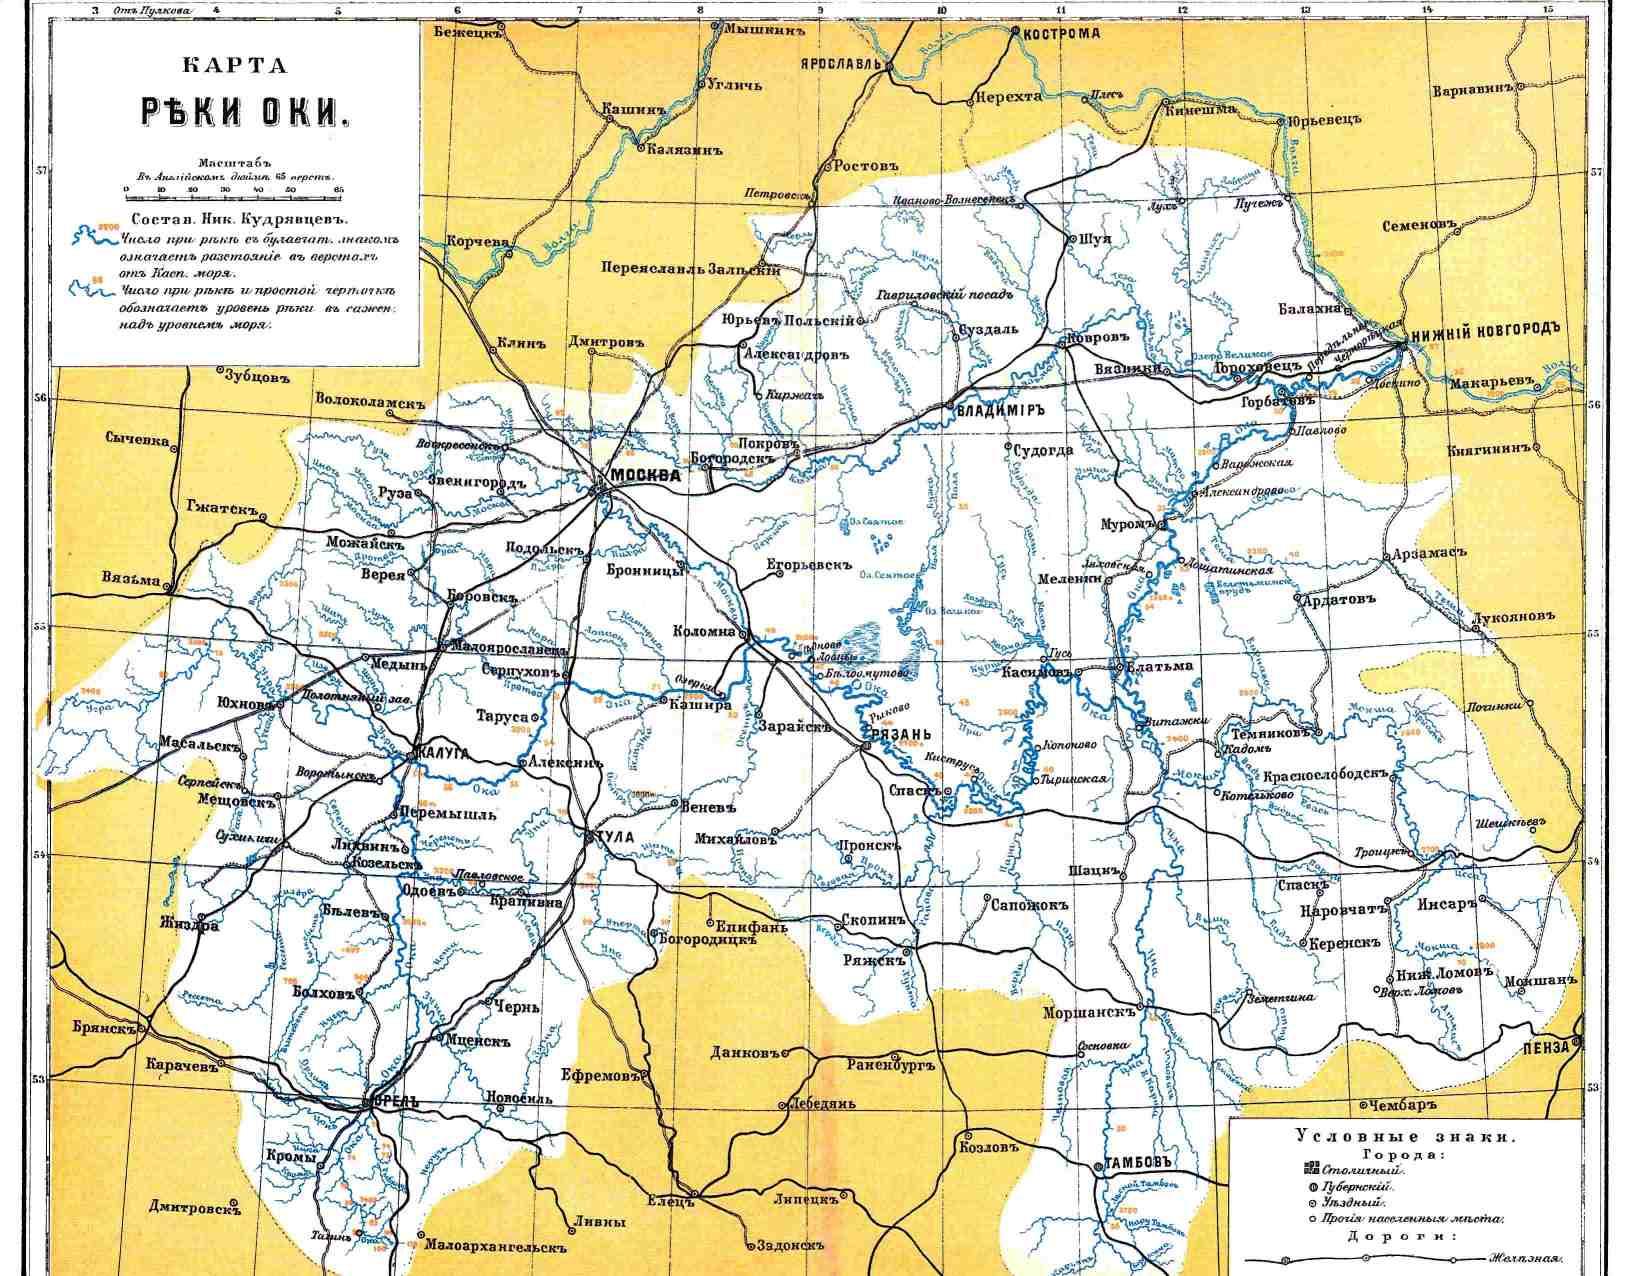 Карта реки оки